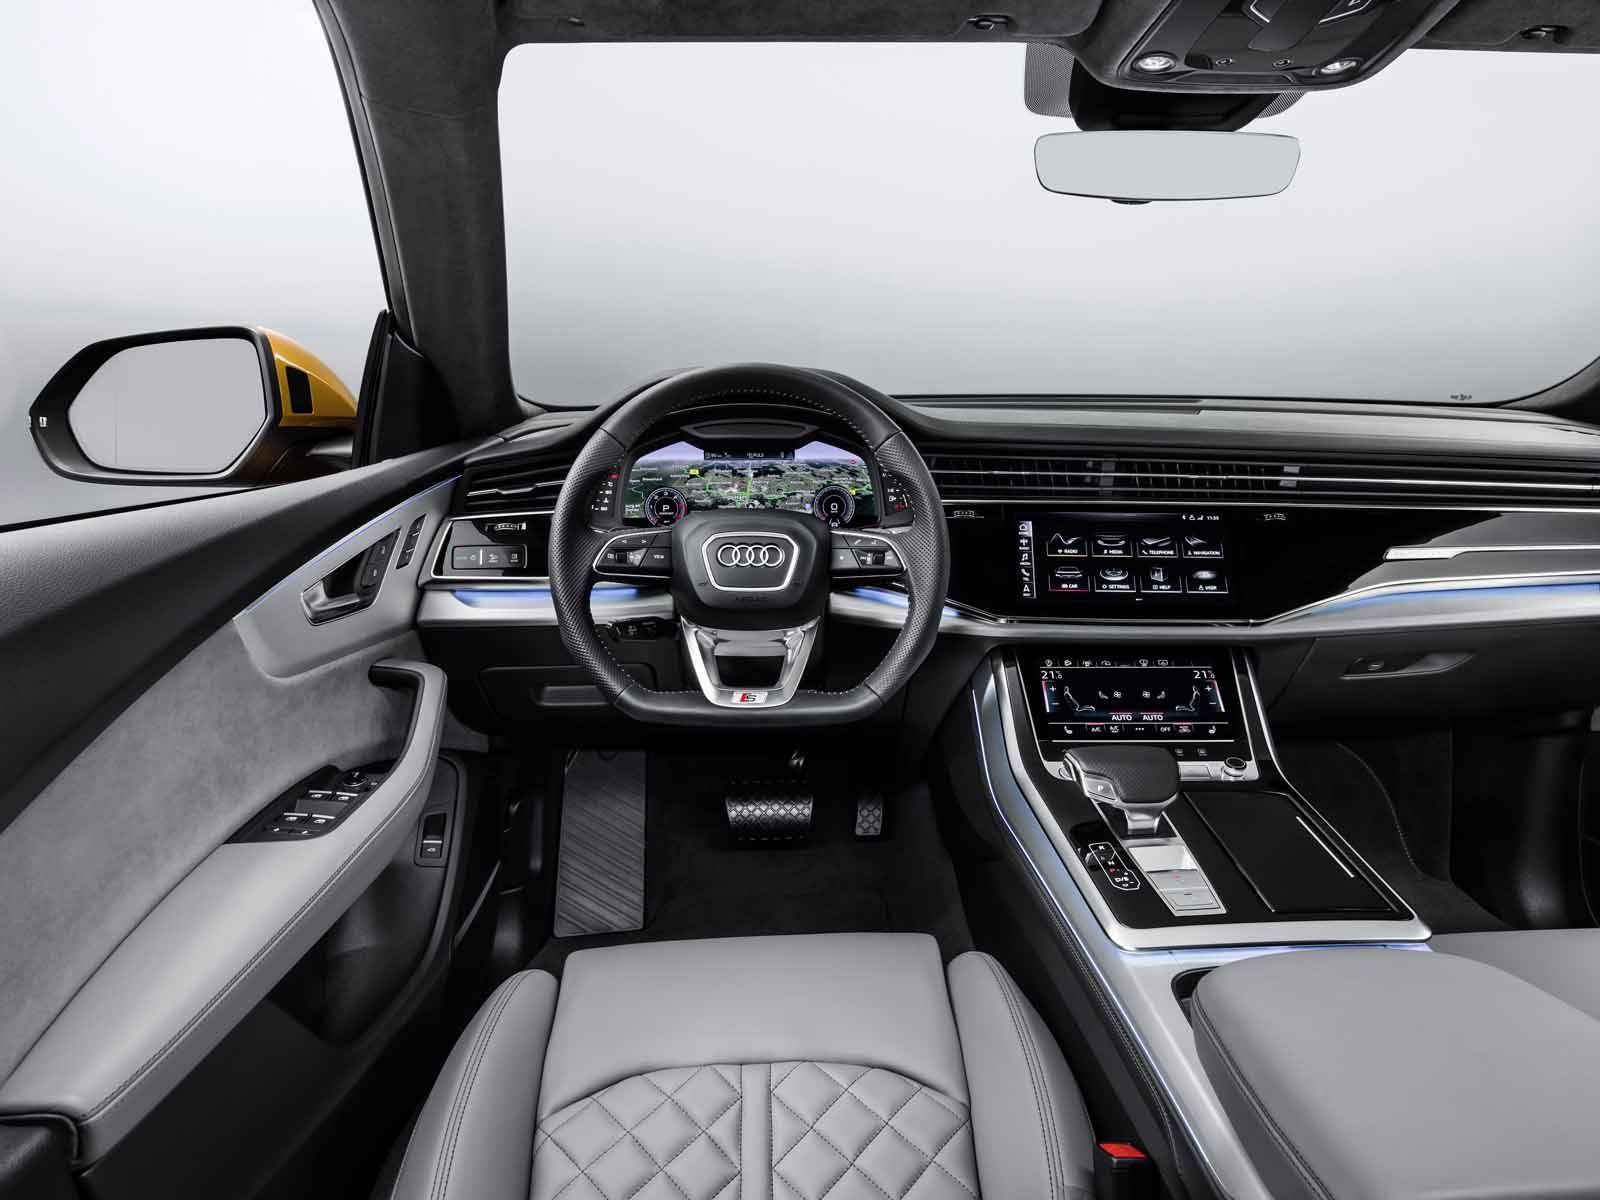 Audi Q8 With Images Audi Suv Audi Renault Megane